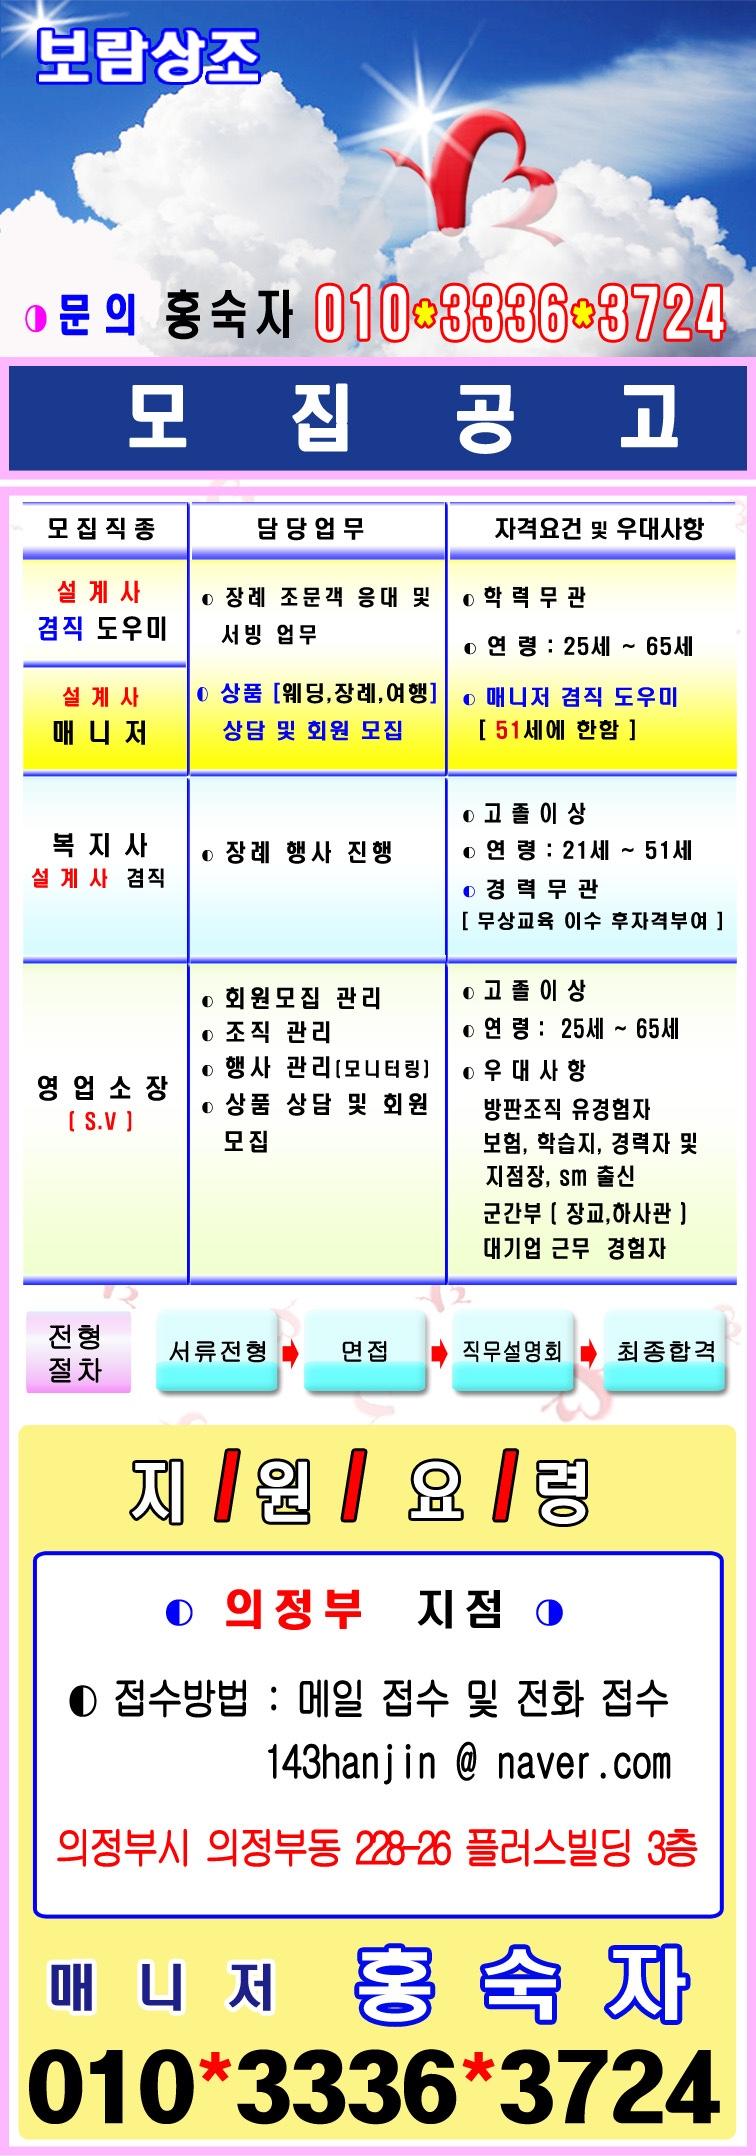 KakaoTalk_Photo_2018-10-06-17-55-03.jpeg